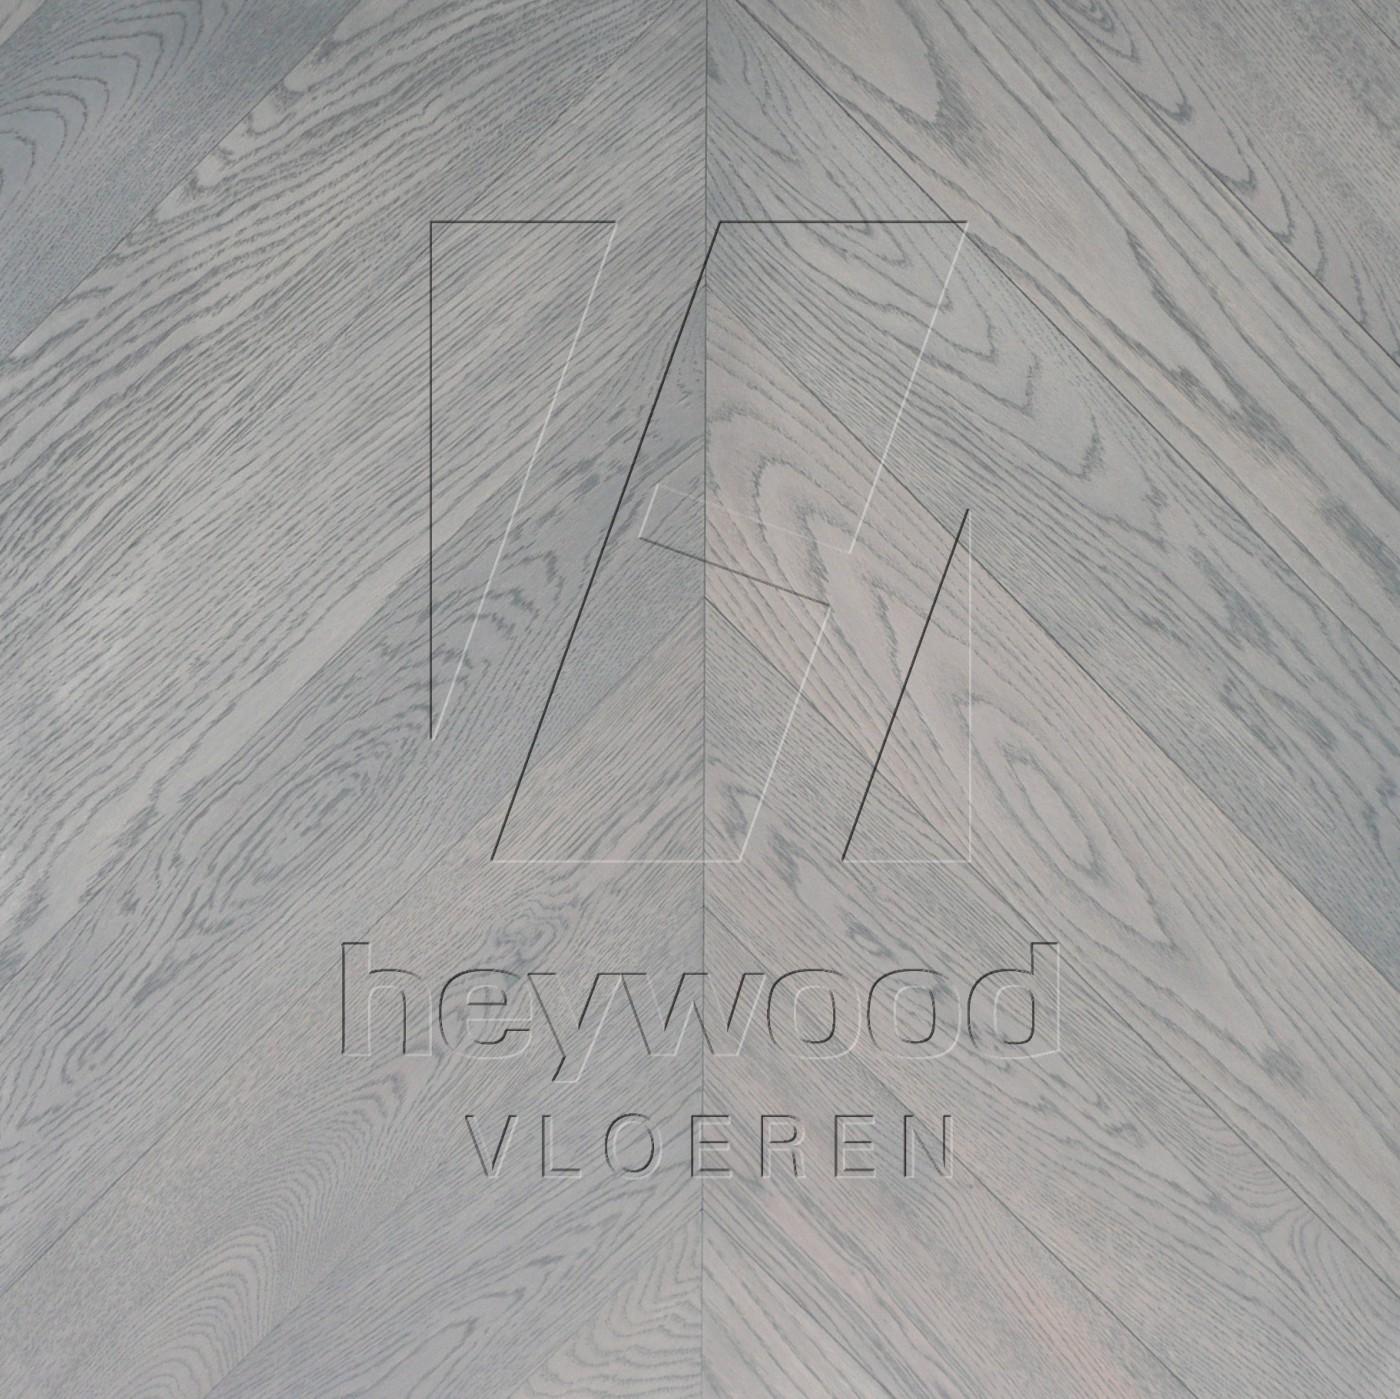 'Montreux' Chevron 45°, Bespoke Elegance in Chevron of Pattern & Panel Floors